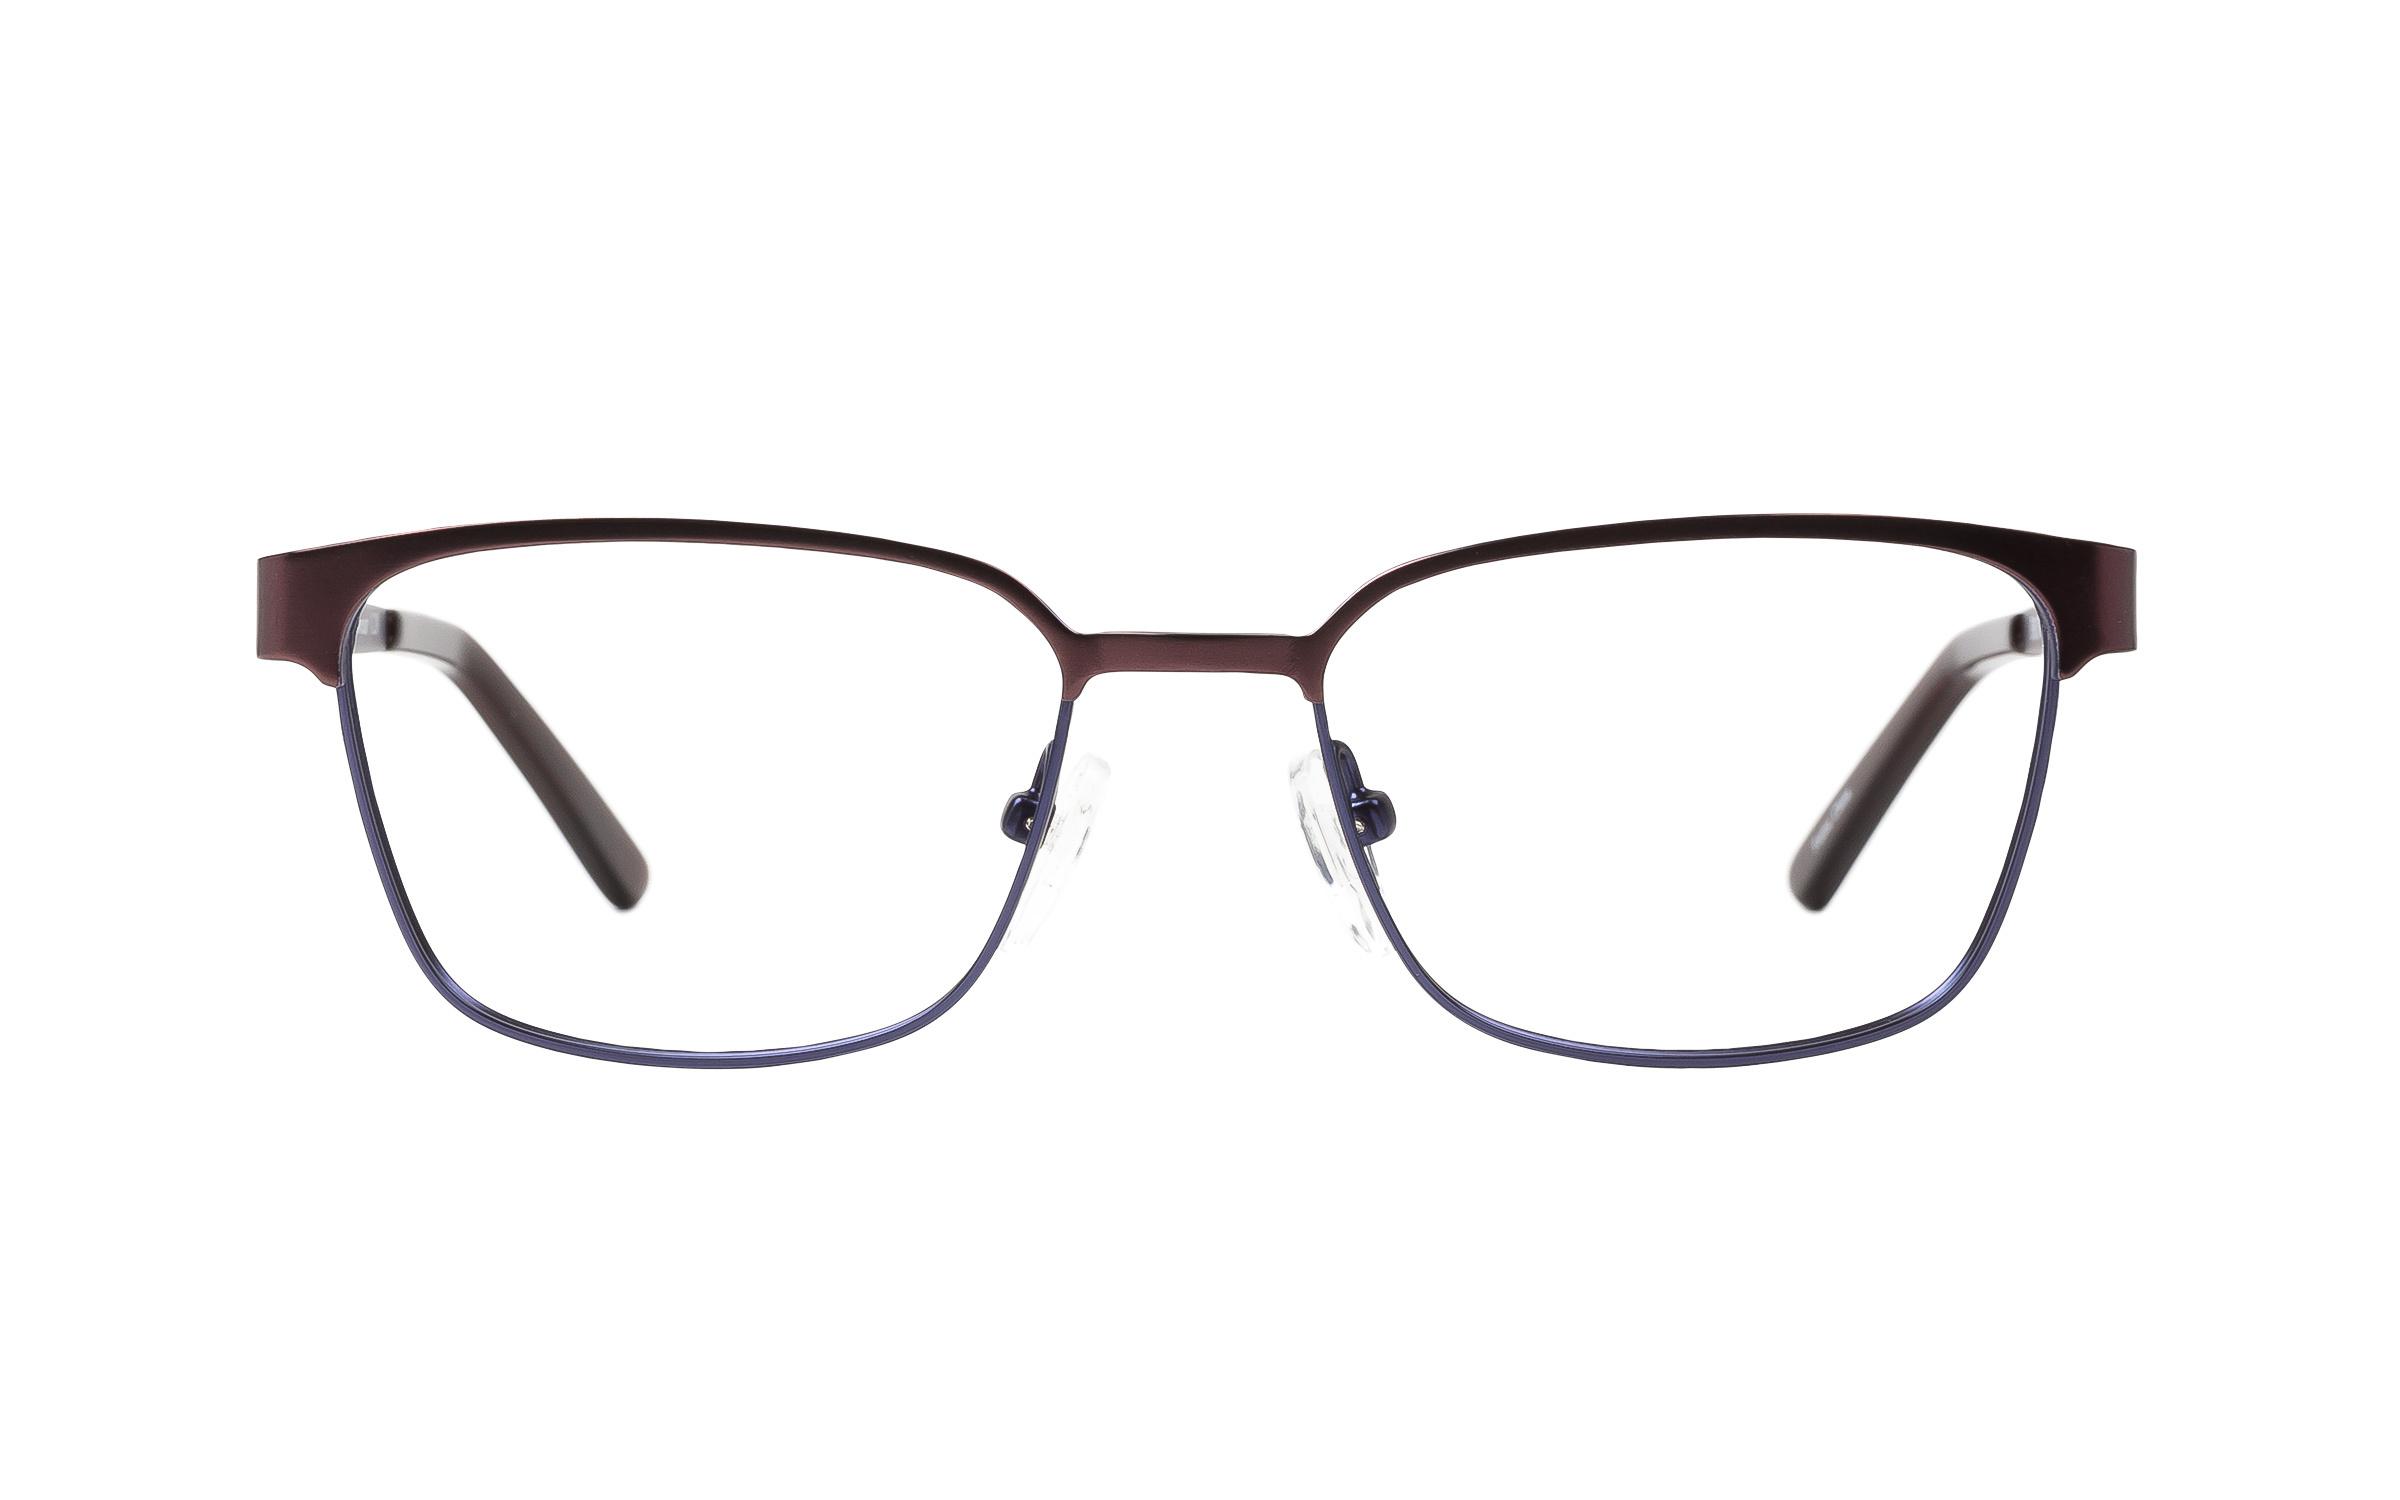 Pez Catch Brown Glasses, Eyeglasses & Frames